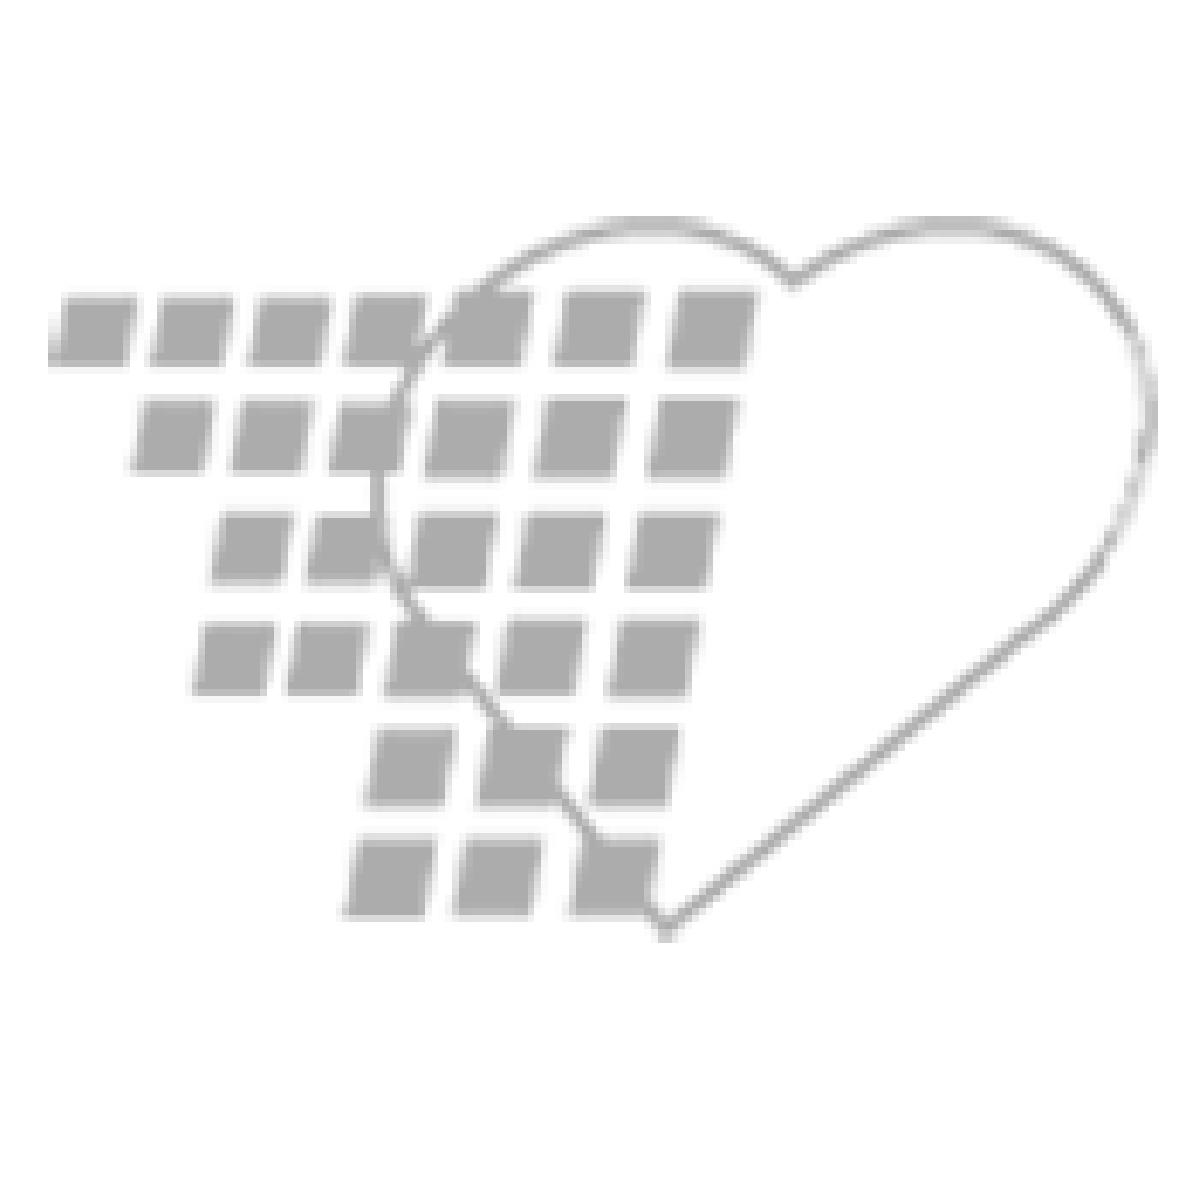 "05-51-0212 - Xeroform   Occlusive Petrolatum Gauze Patch - 1"" x 8"""